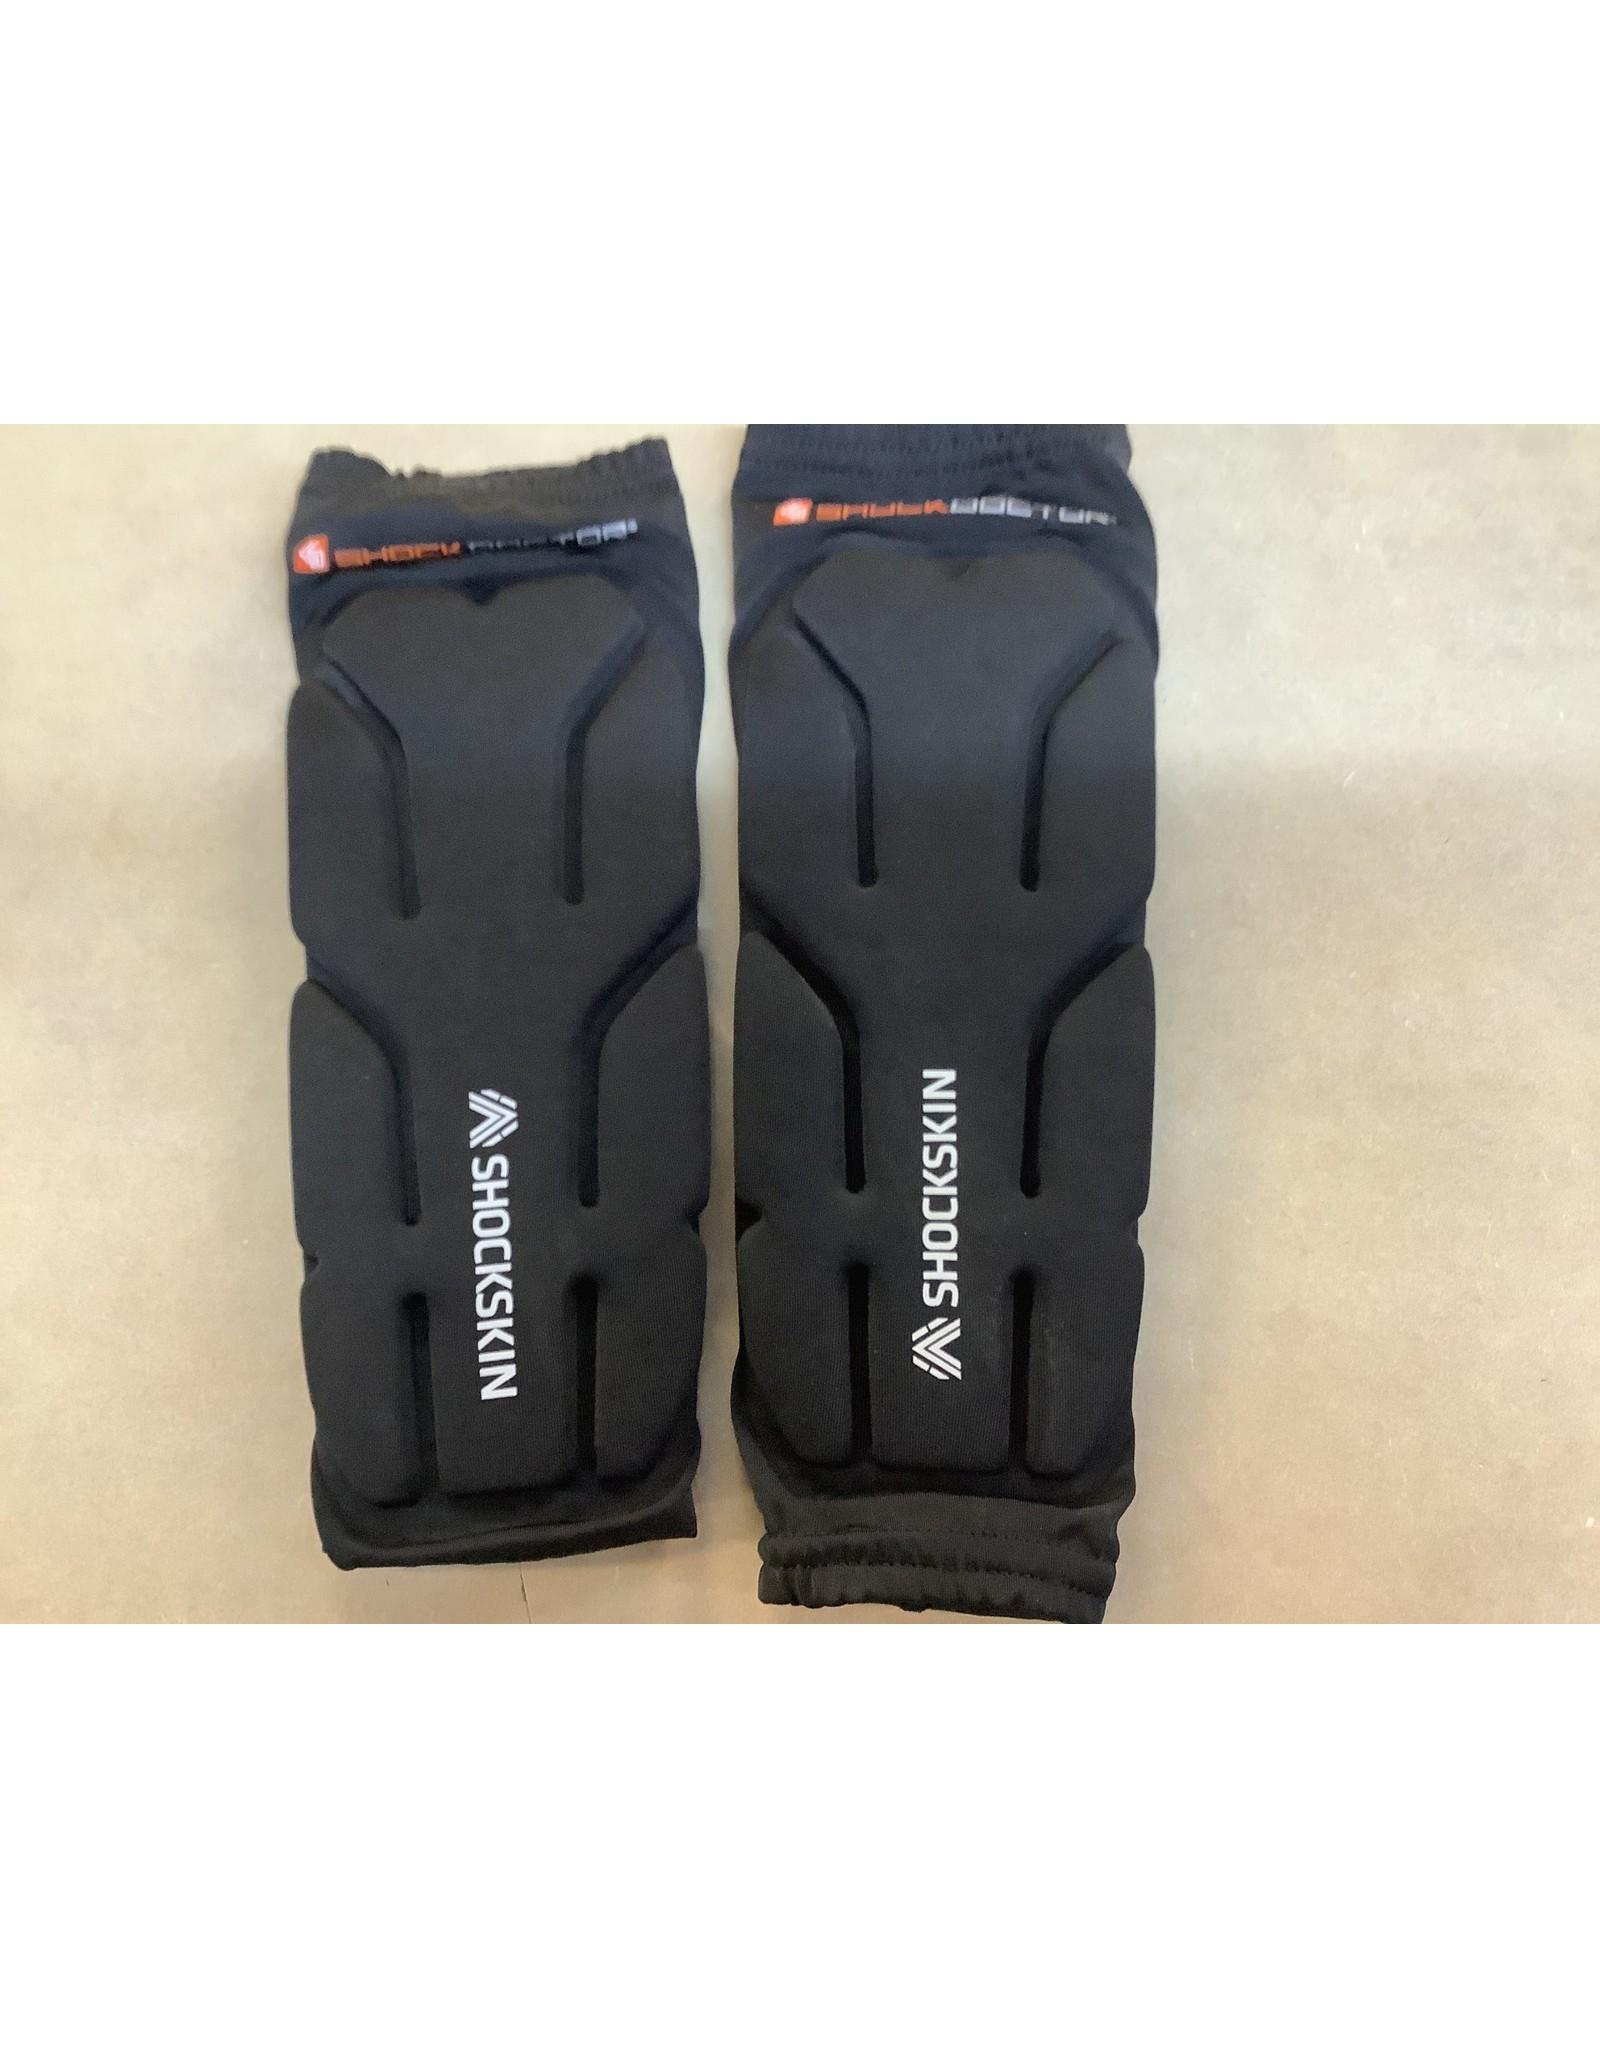 Shock Doctor Shock Skin Forearm Guards - Pair